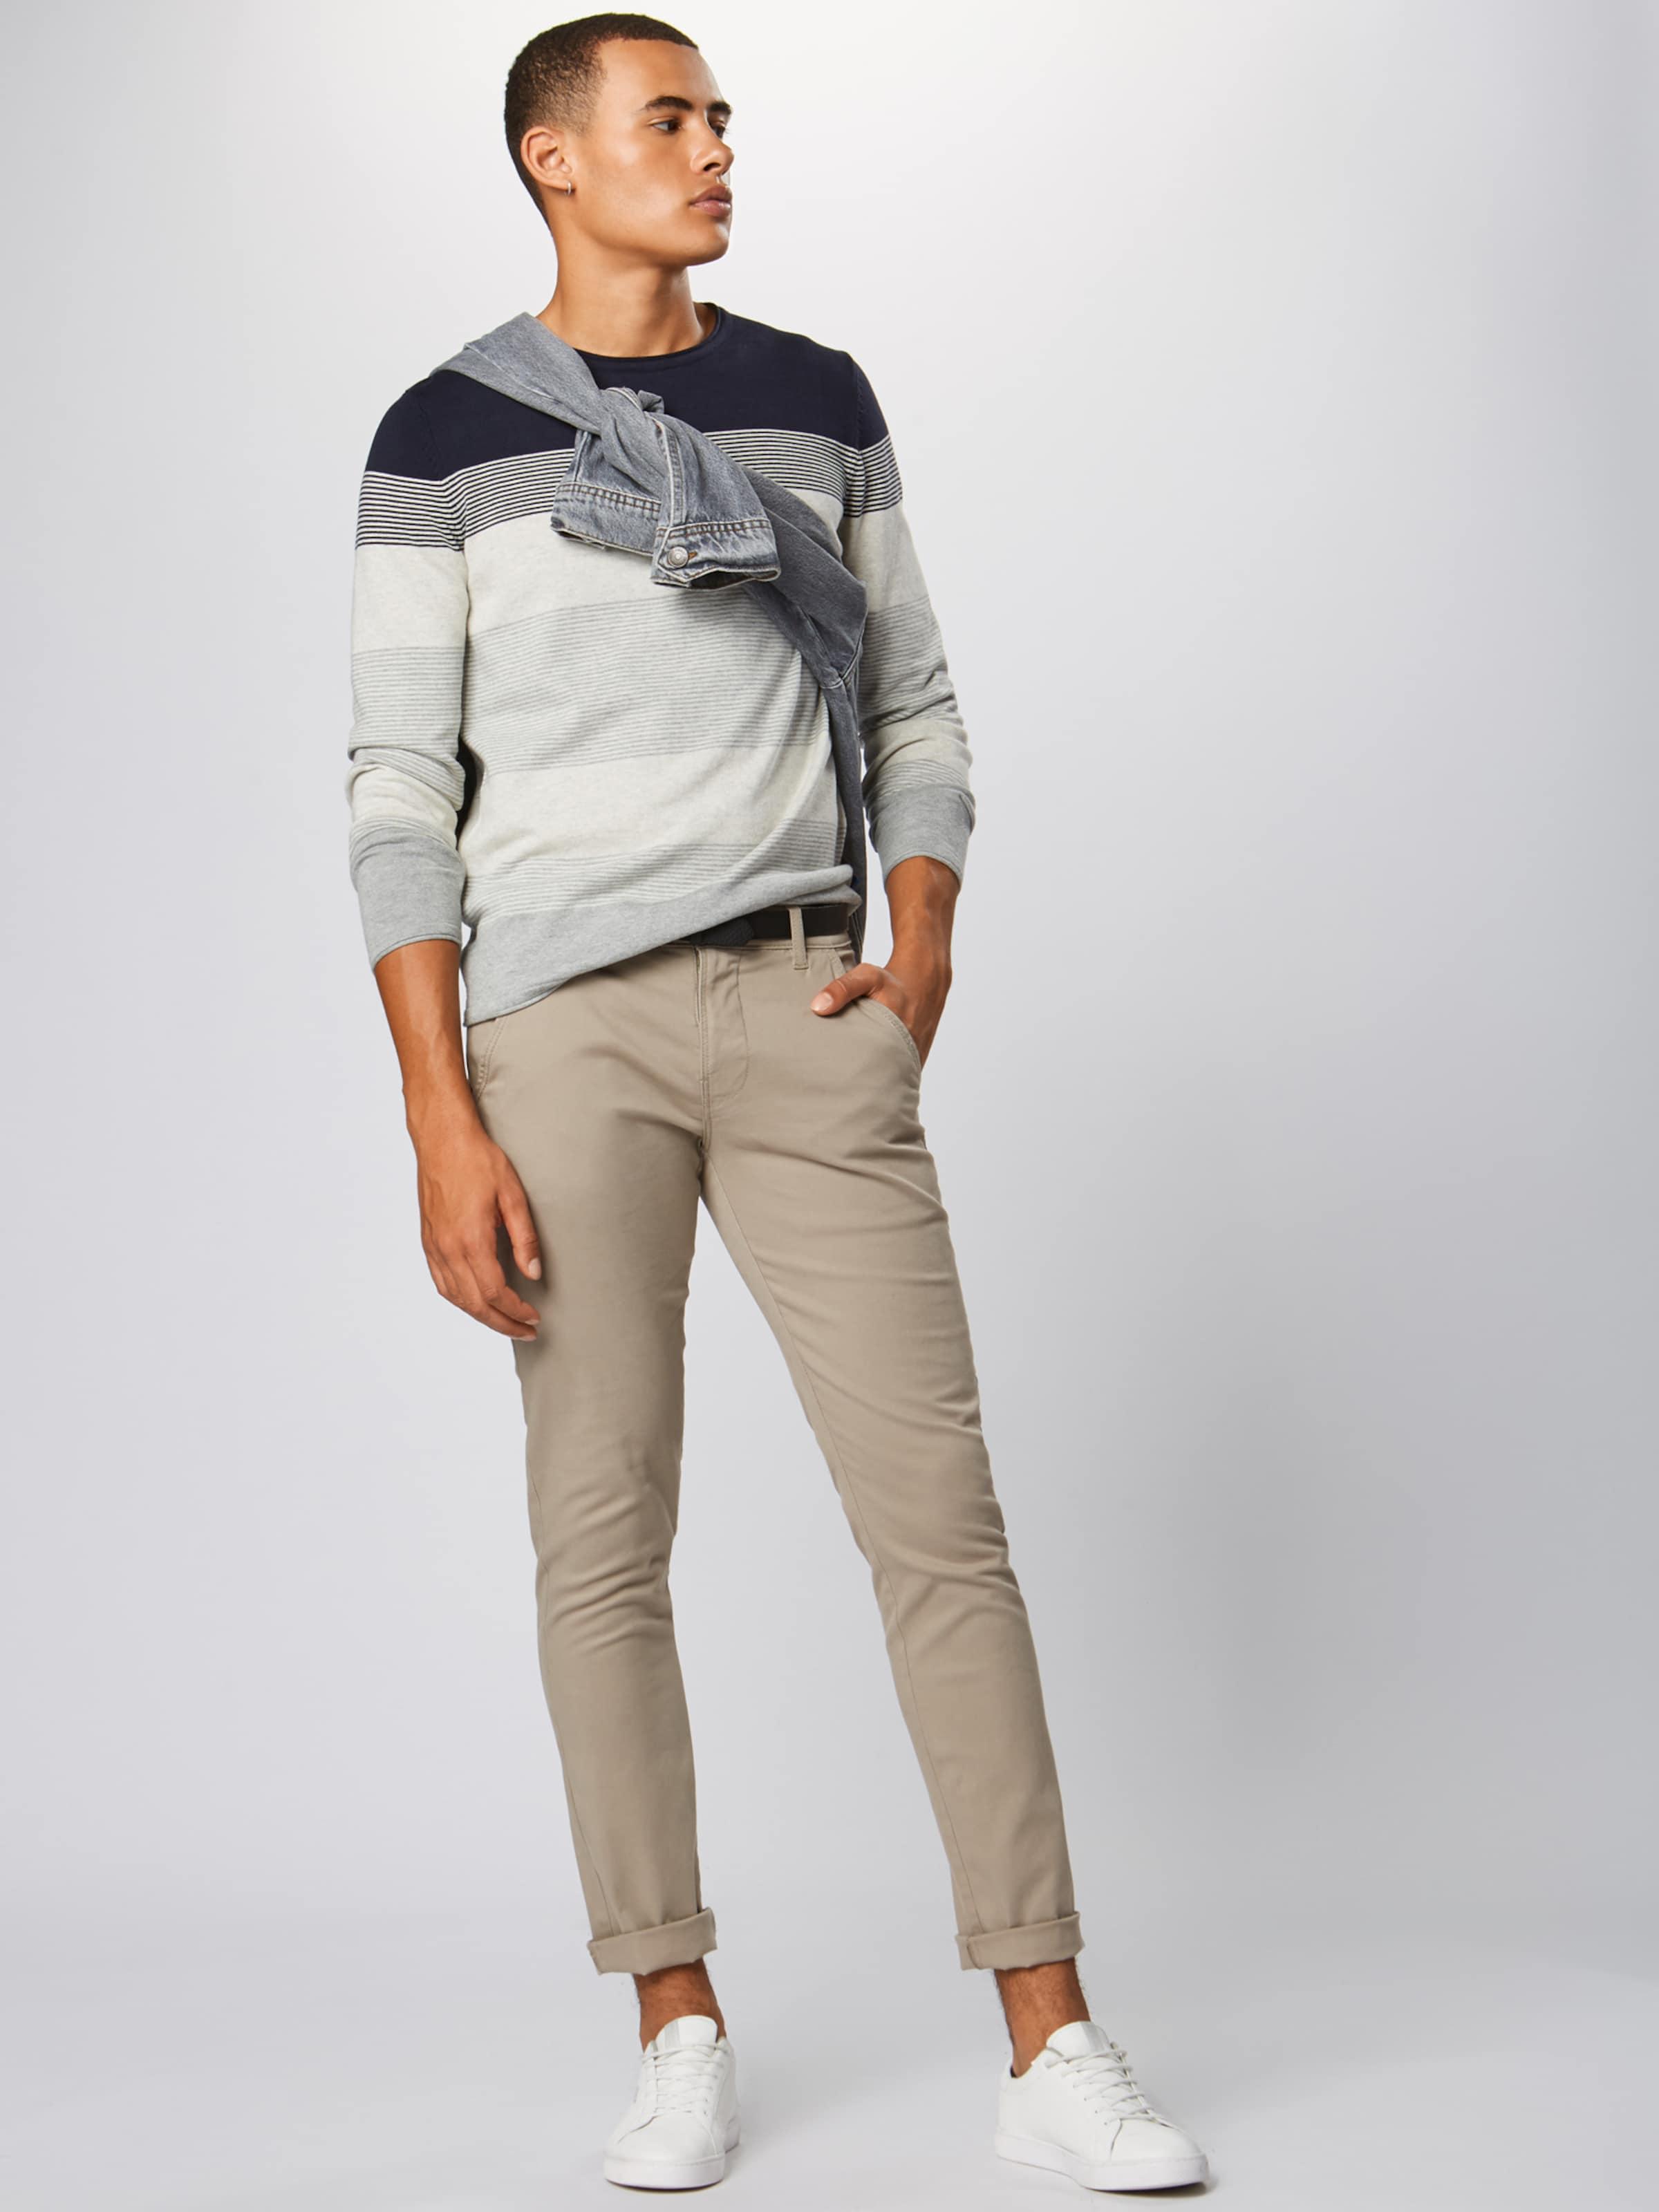 En By over Bleu Edc Pull MarineNoir Blanc Esprit rWdCoeBQx